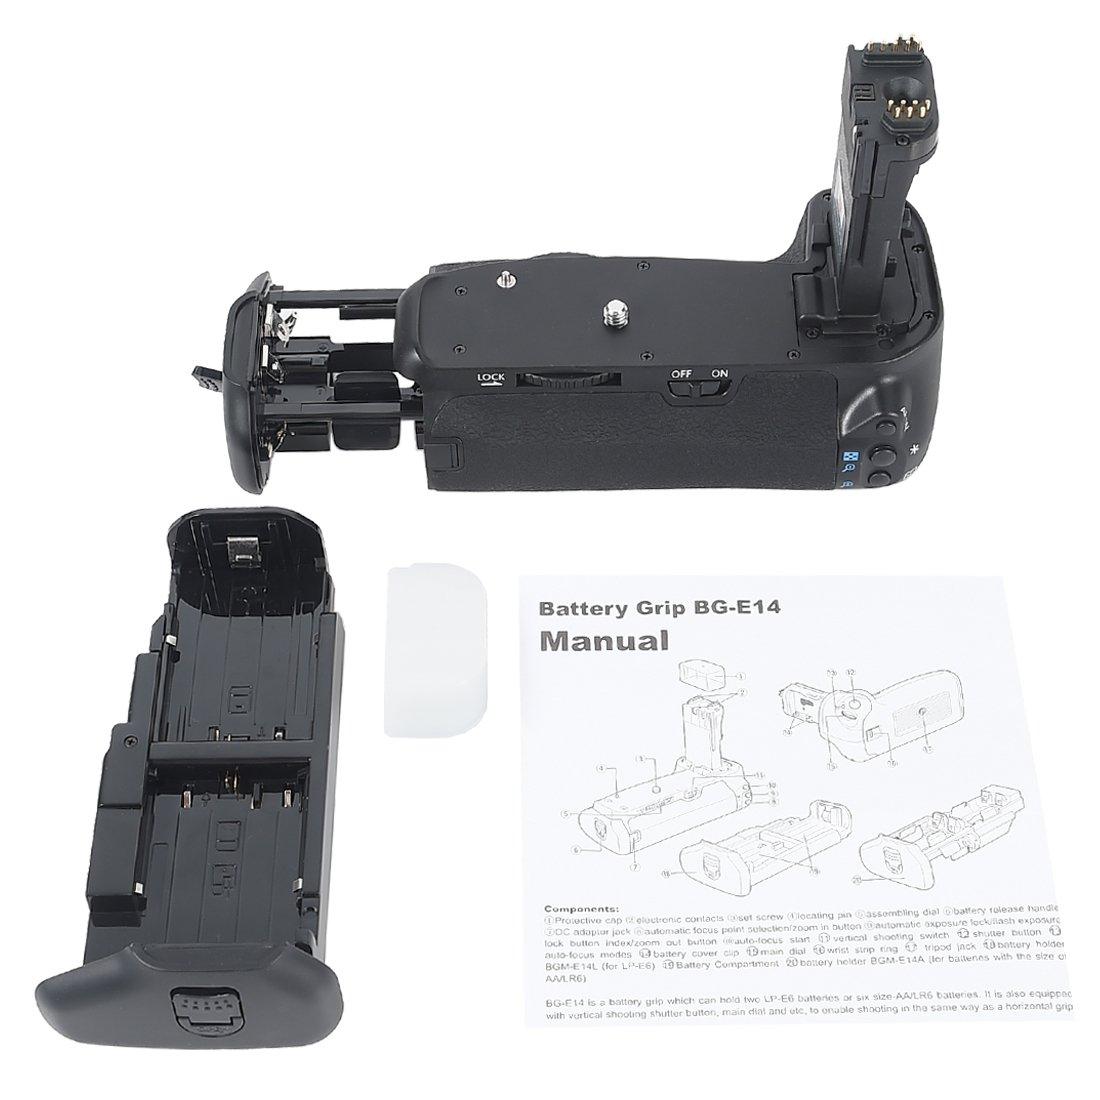 DSTE Pro BG-E14 Vertical Battery Grip + 2x LP-E6 LP-E6N for Canon EOS 70D 80D SLR Digital Camera